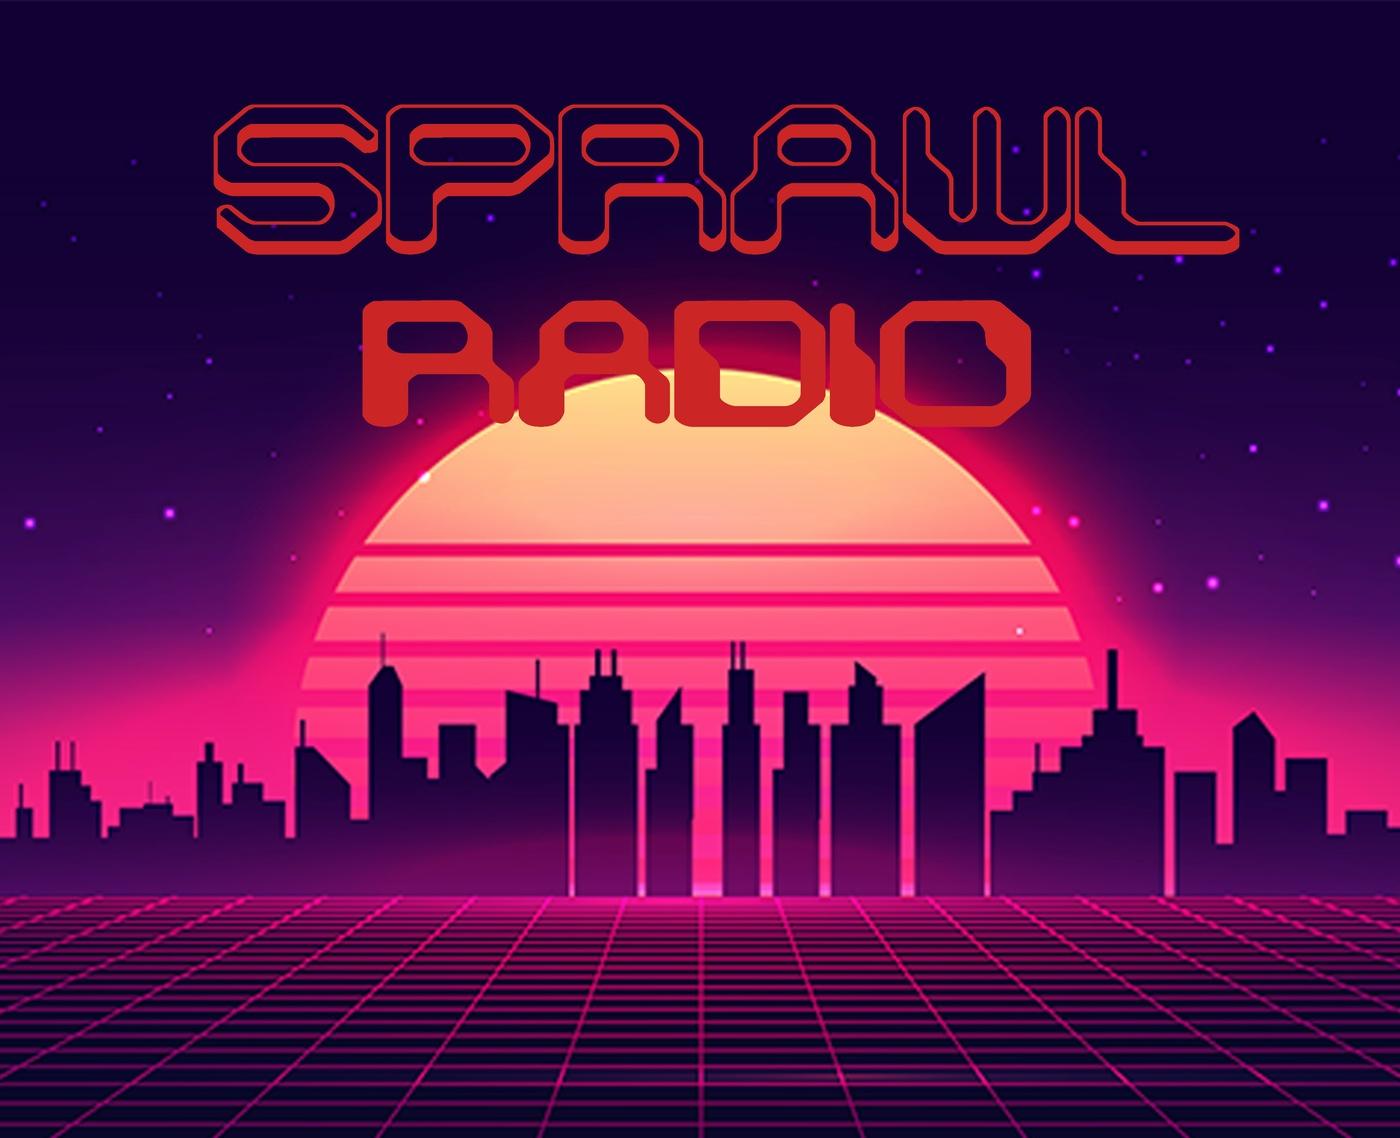 https://sprawlradiopodcast.podigee.io/